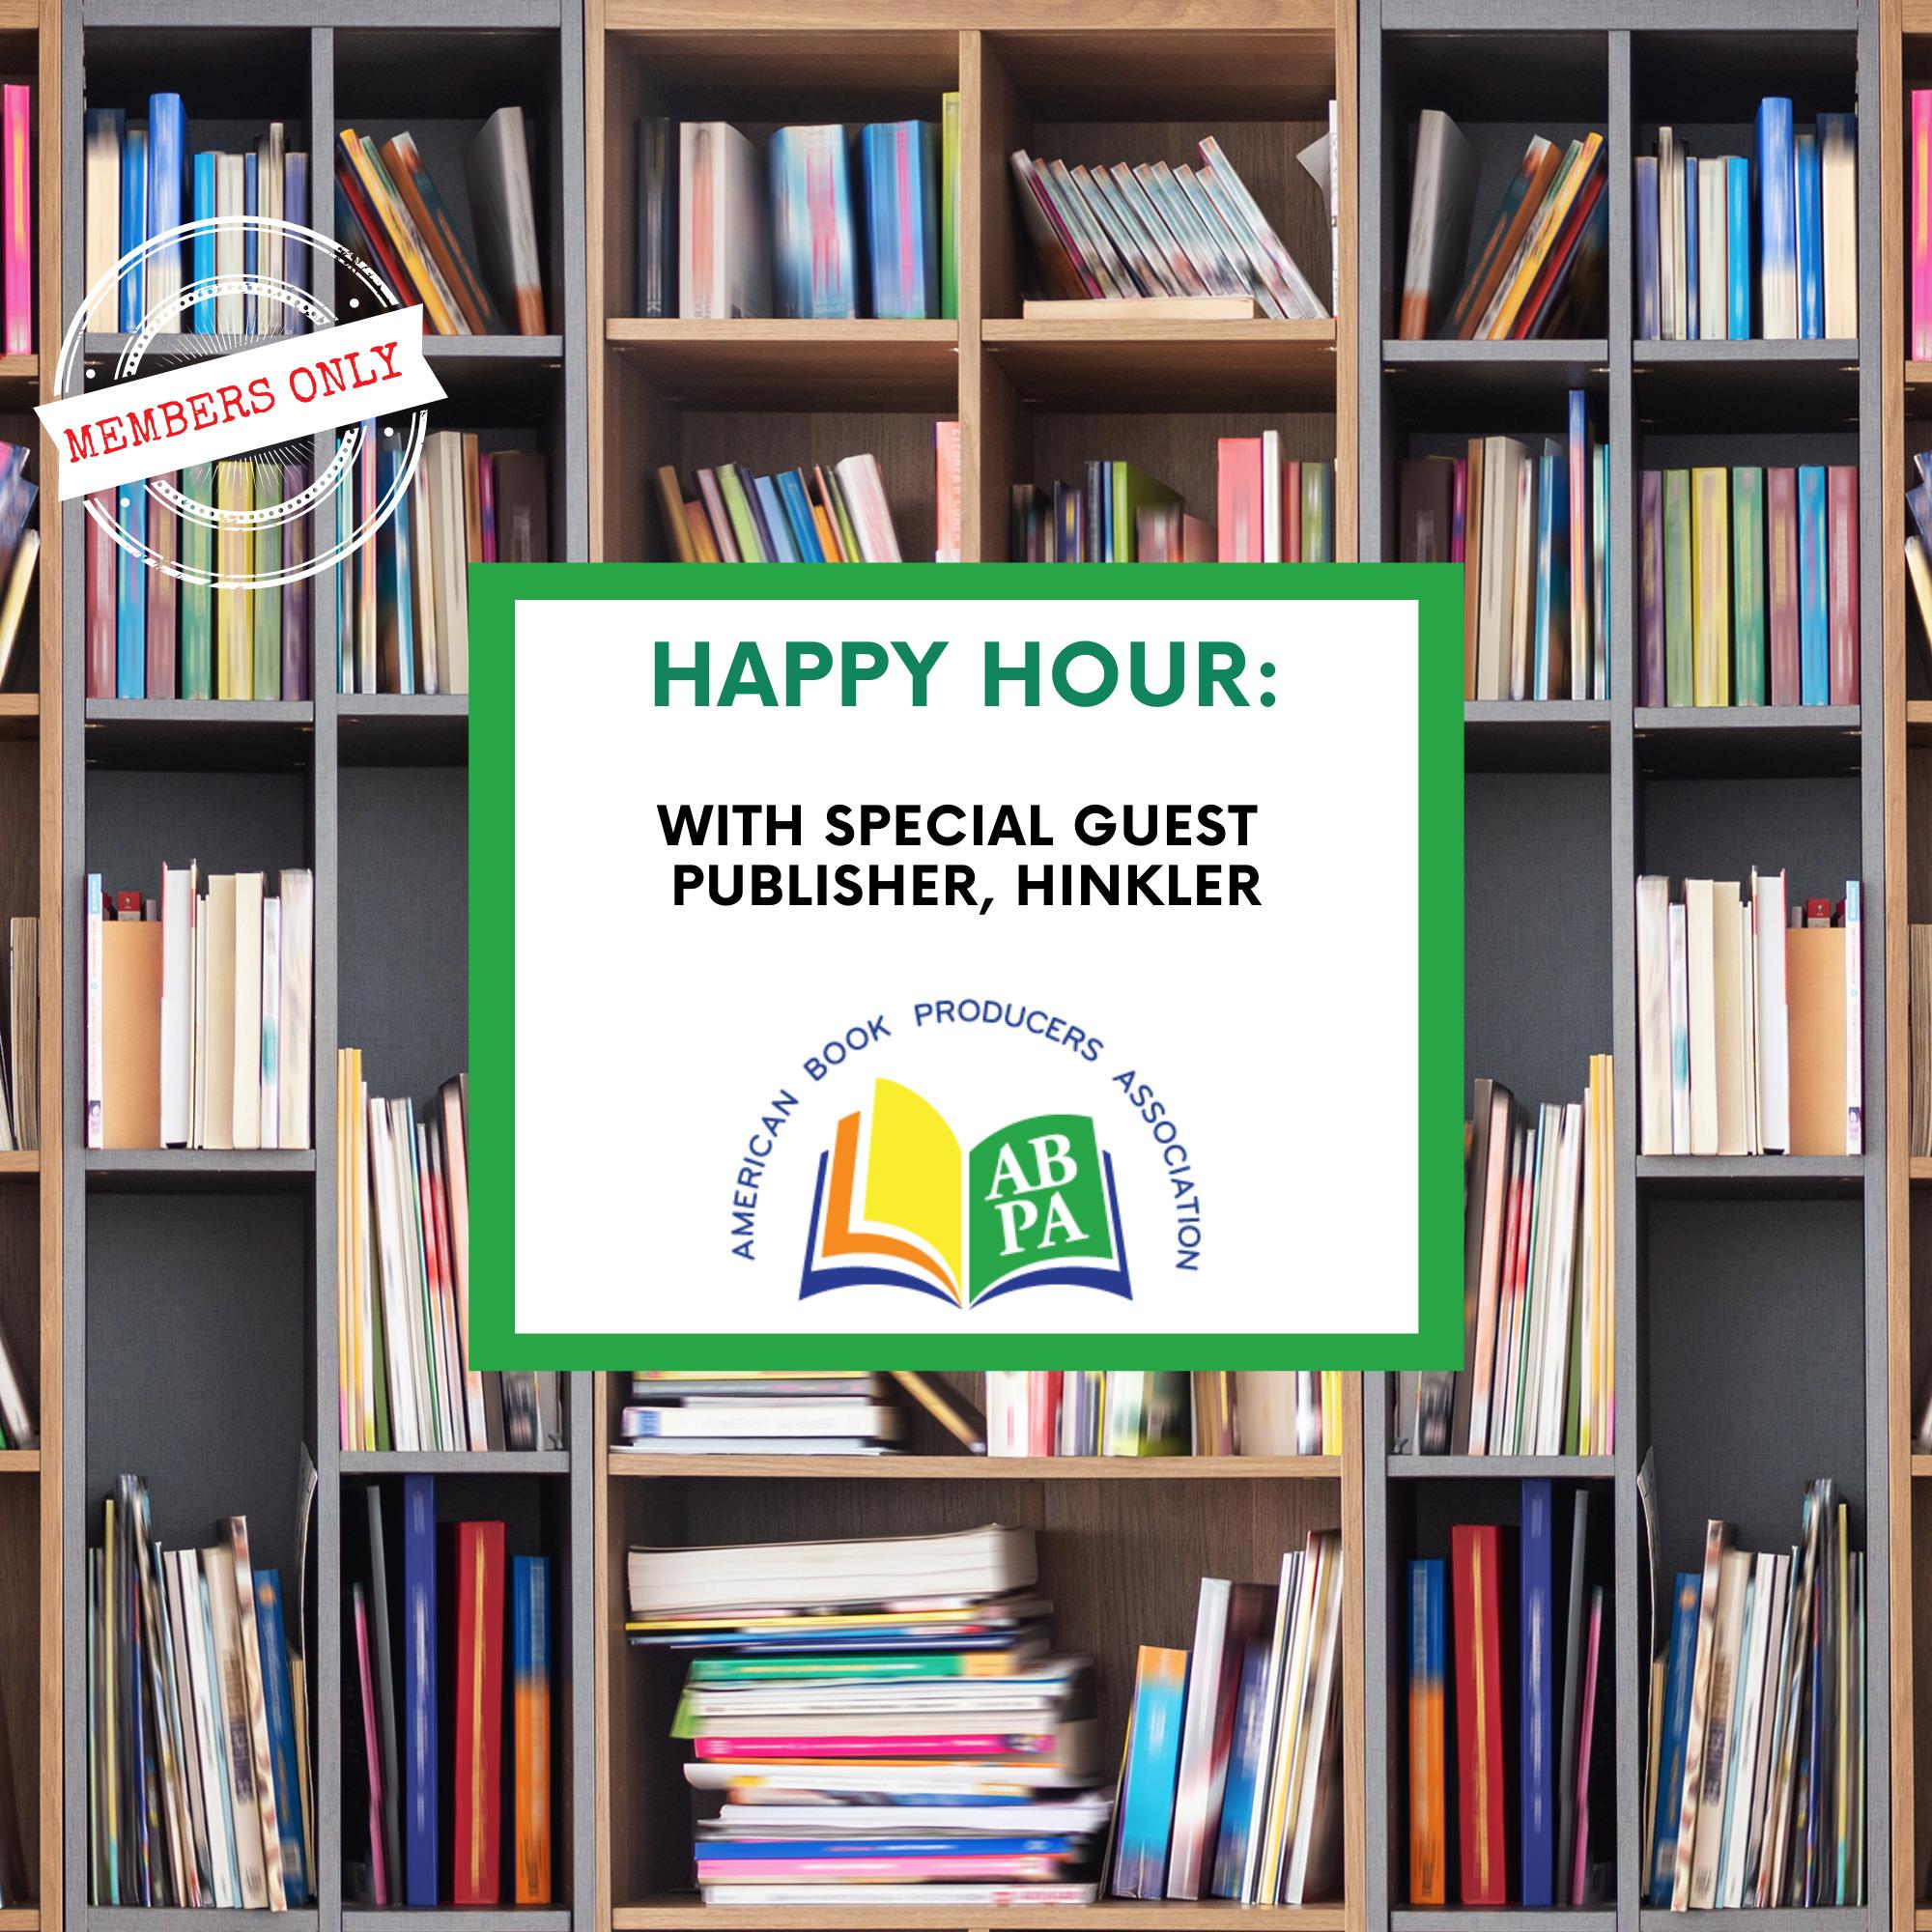 FB - ABPA Happy Hour - Chronicle Books